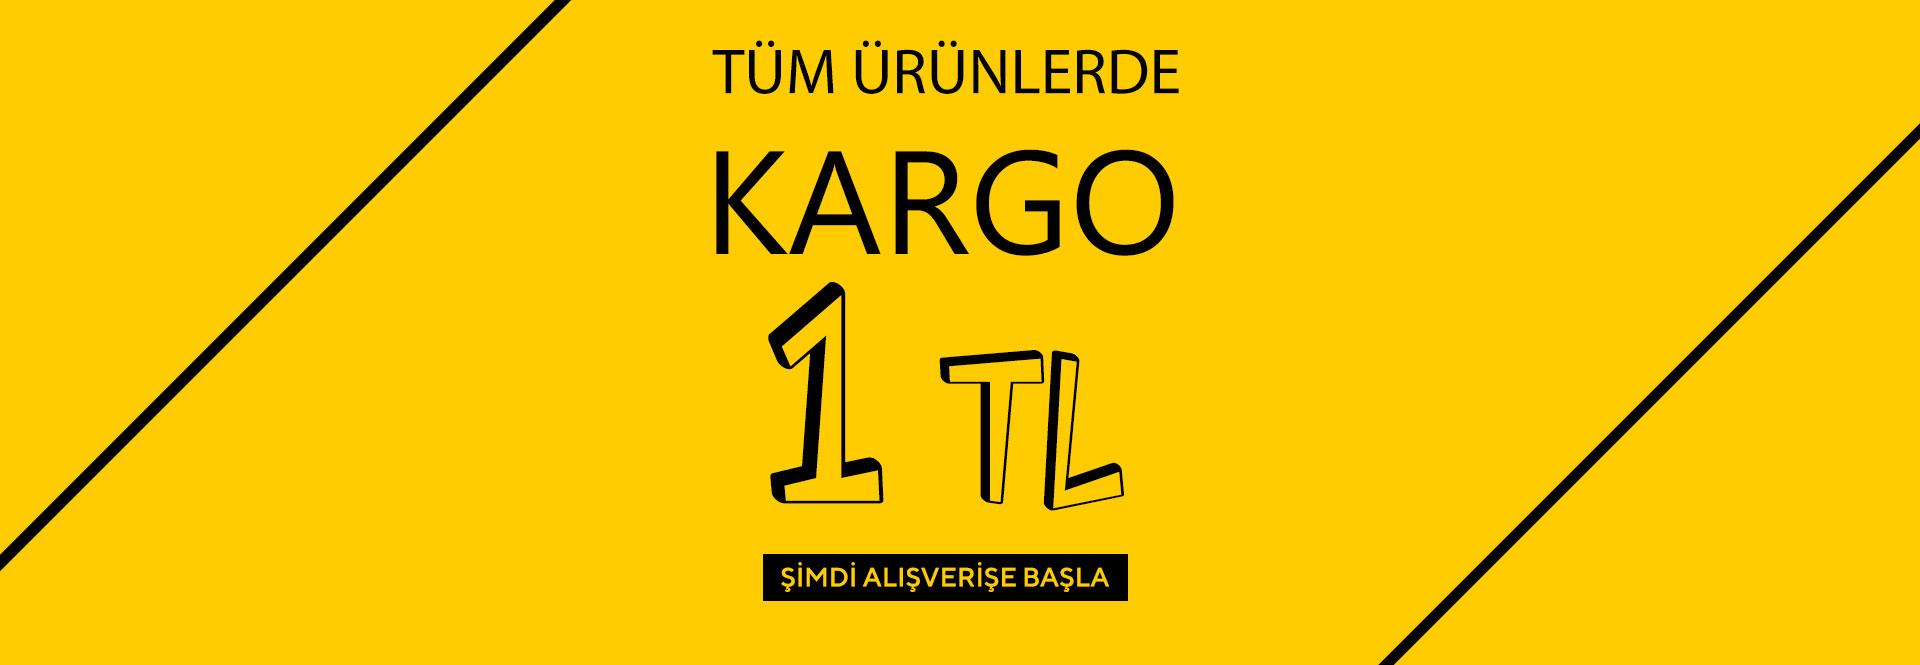 KARGO 1 TL